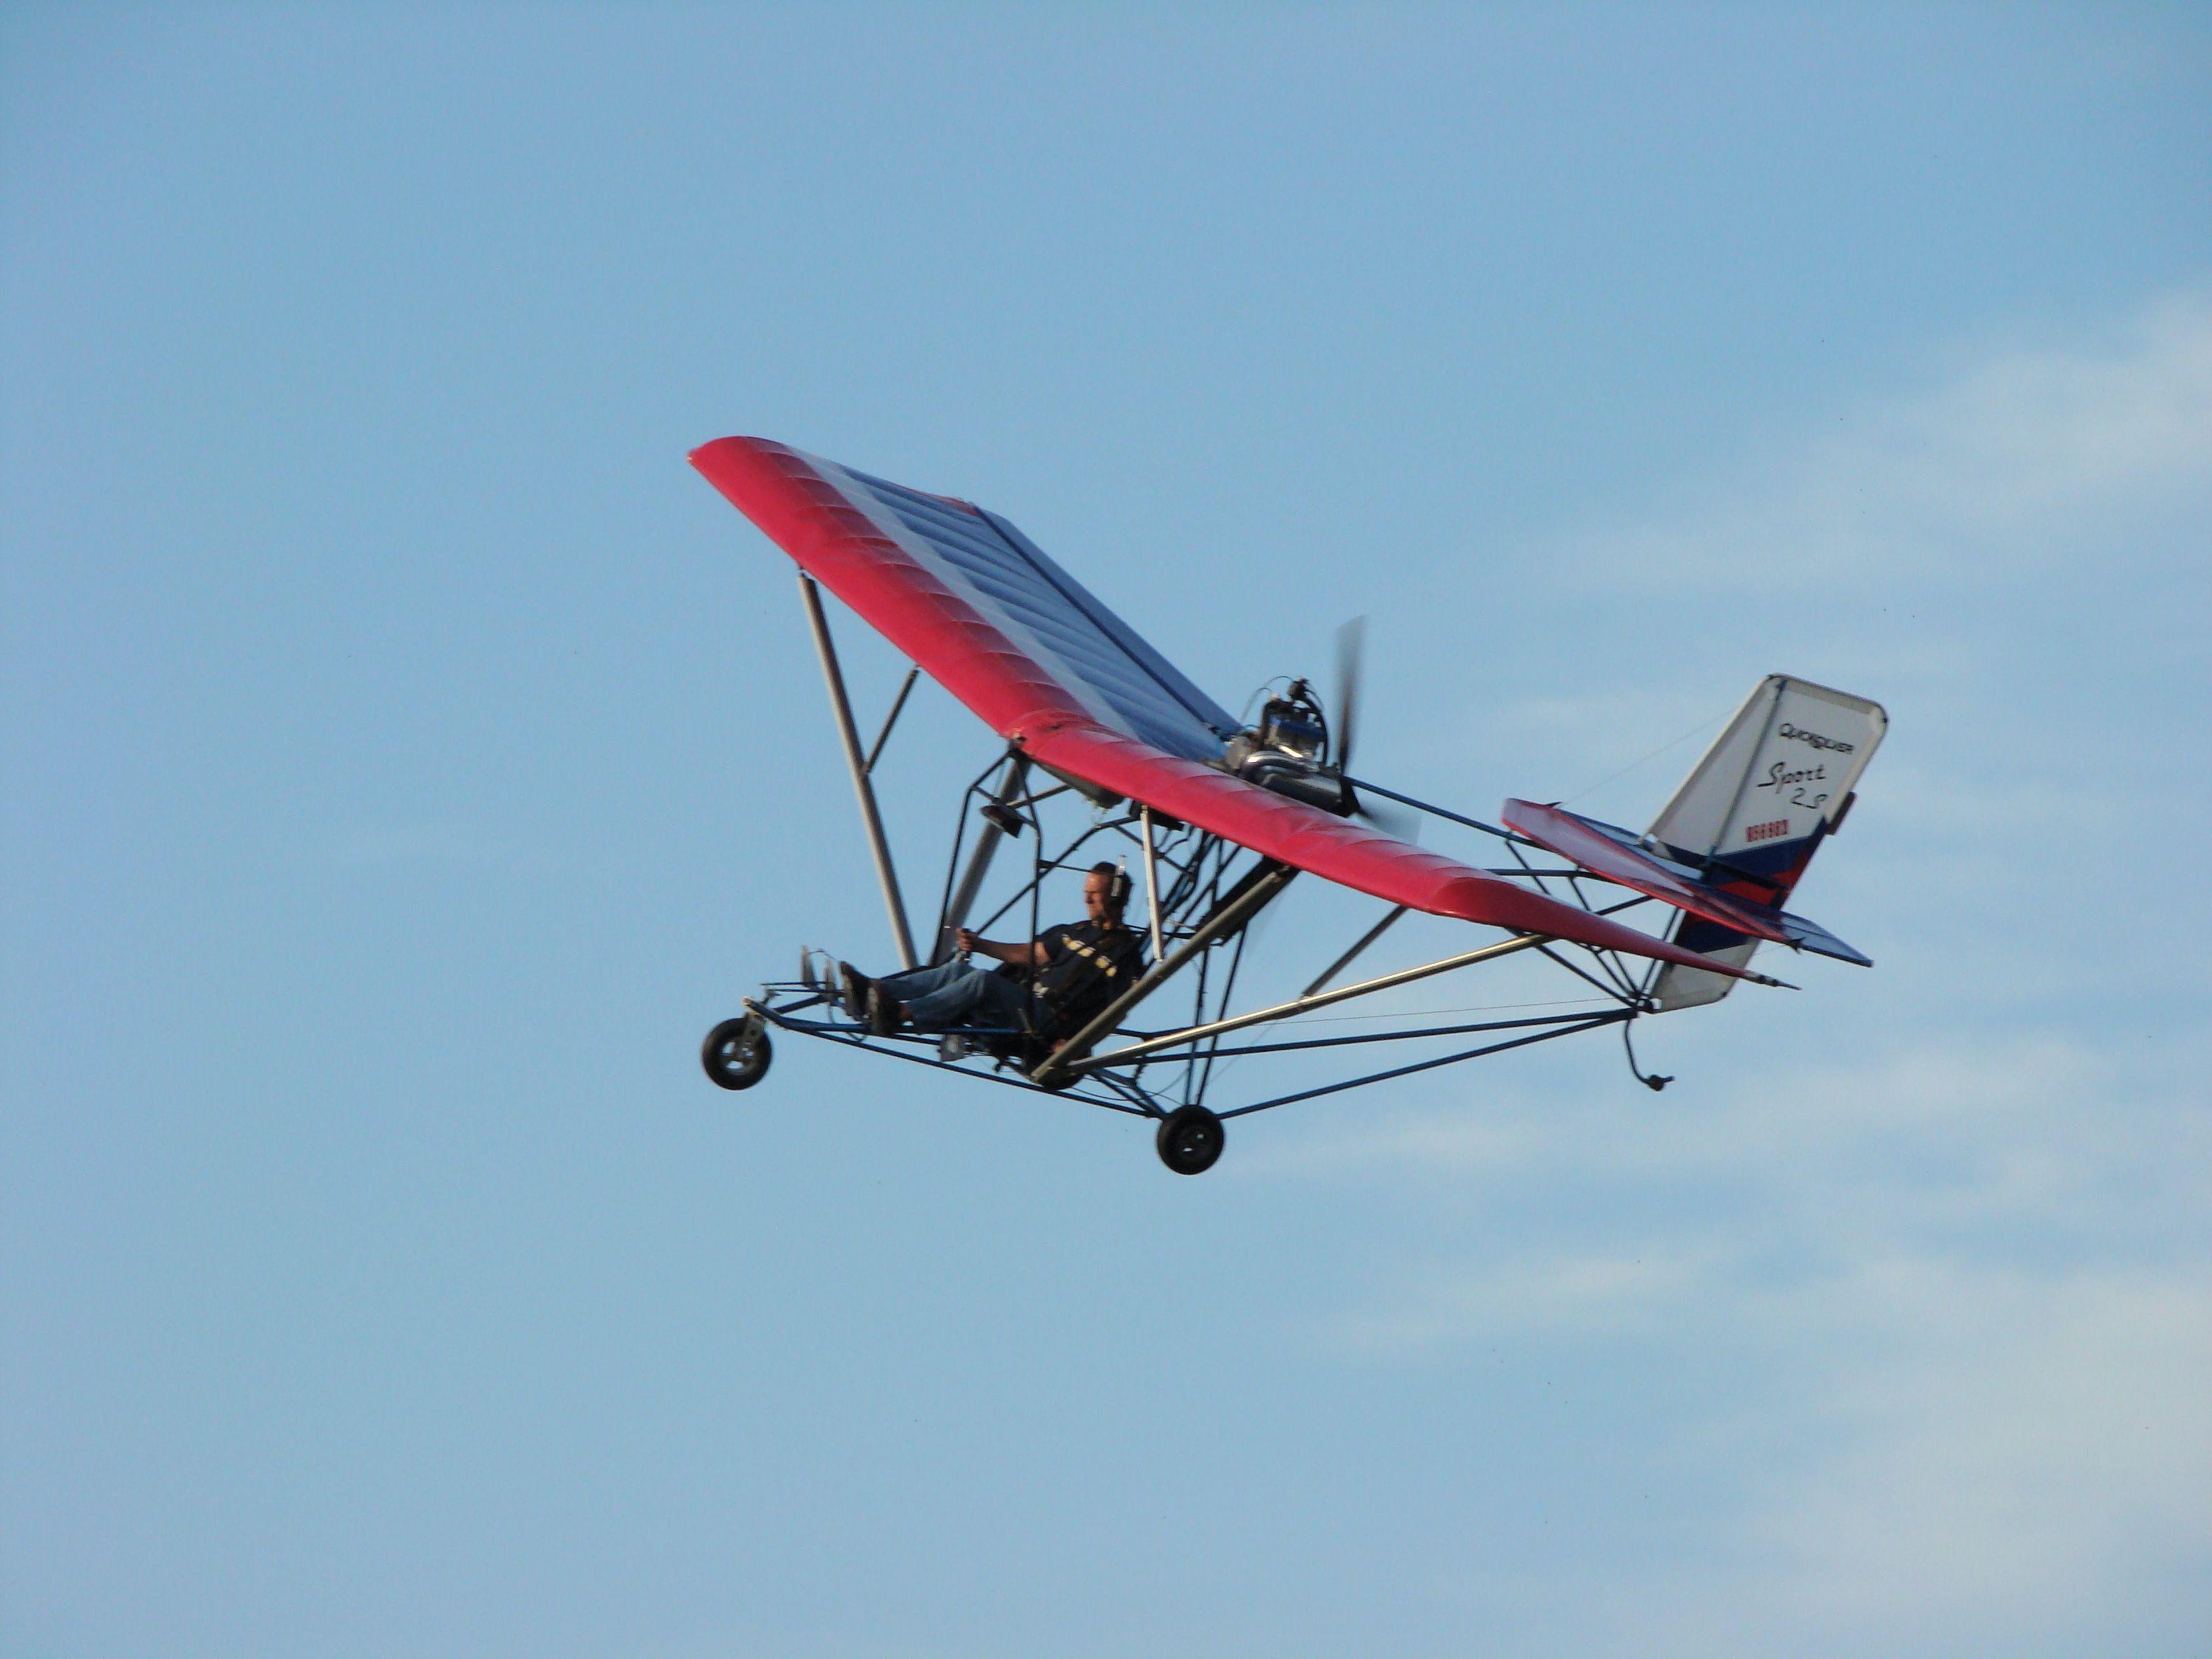 Quicksilver ultralights quicksilver sport ii s quicksilver ultralight ultralight aircraft of iowa and